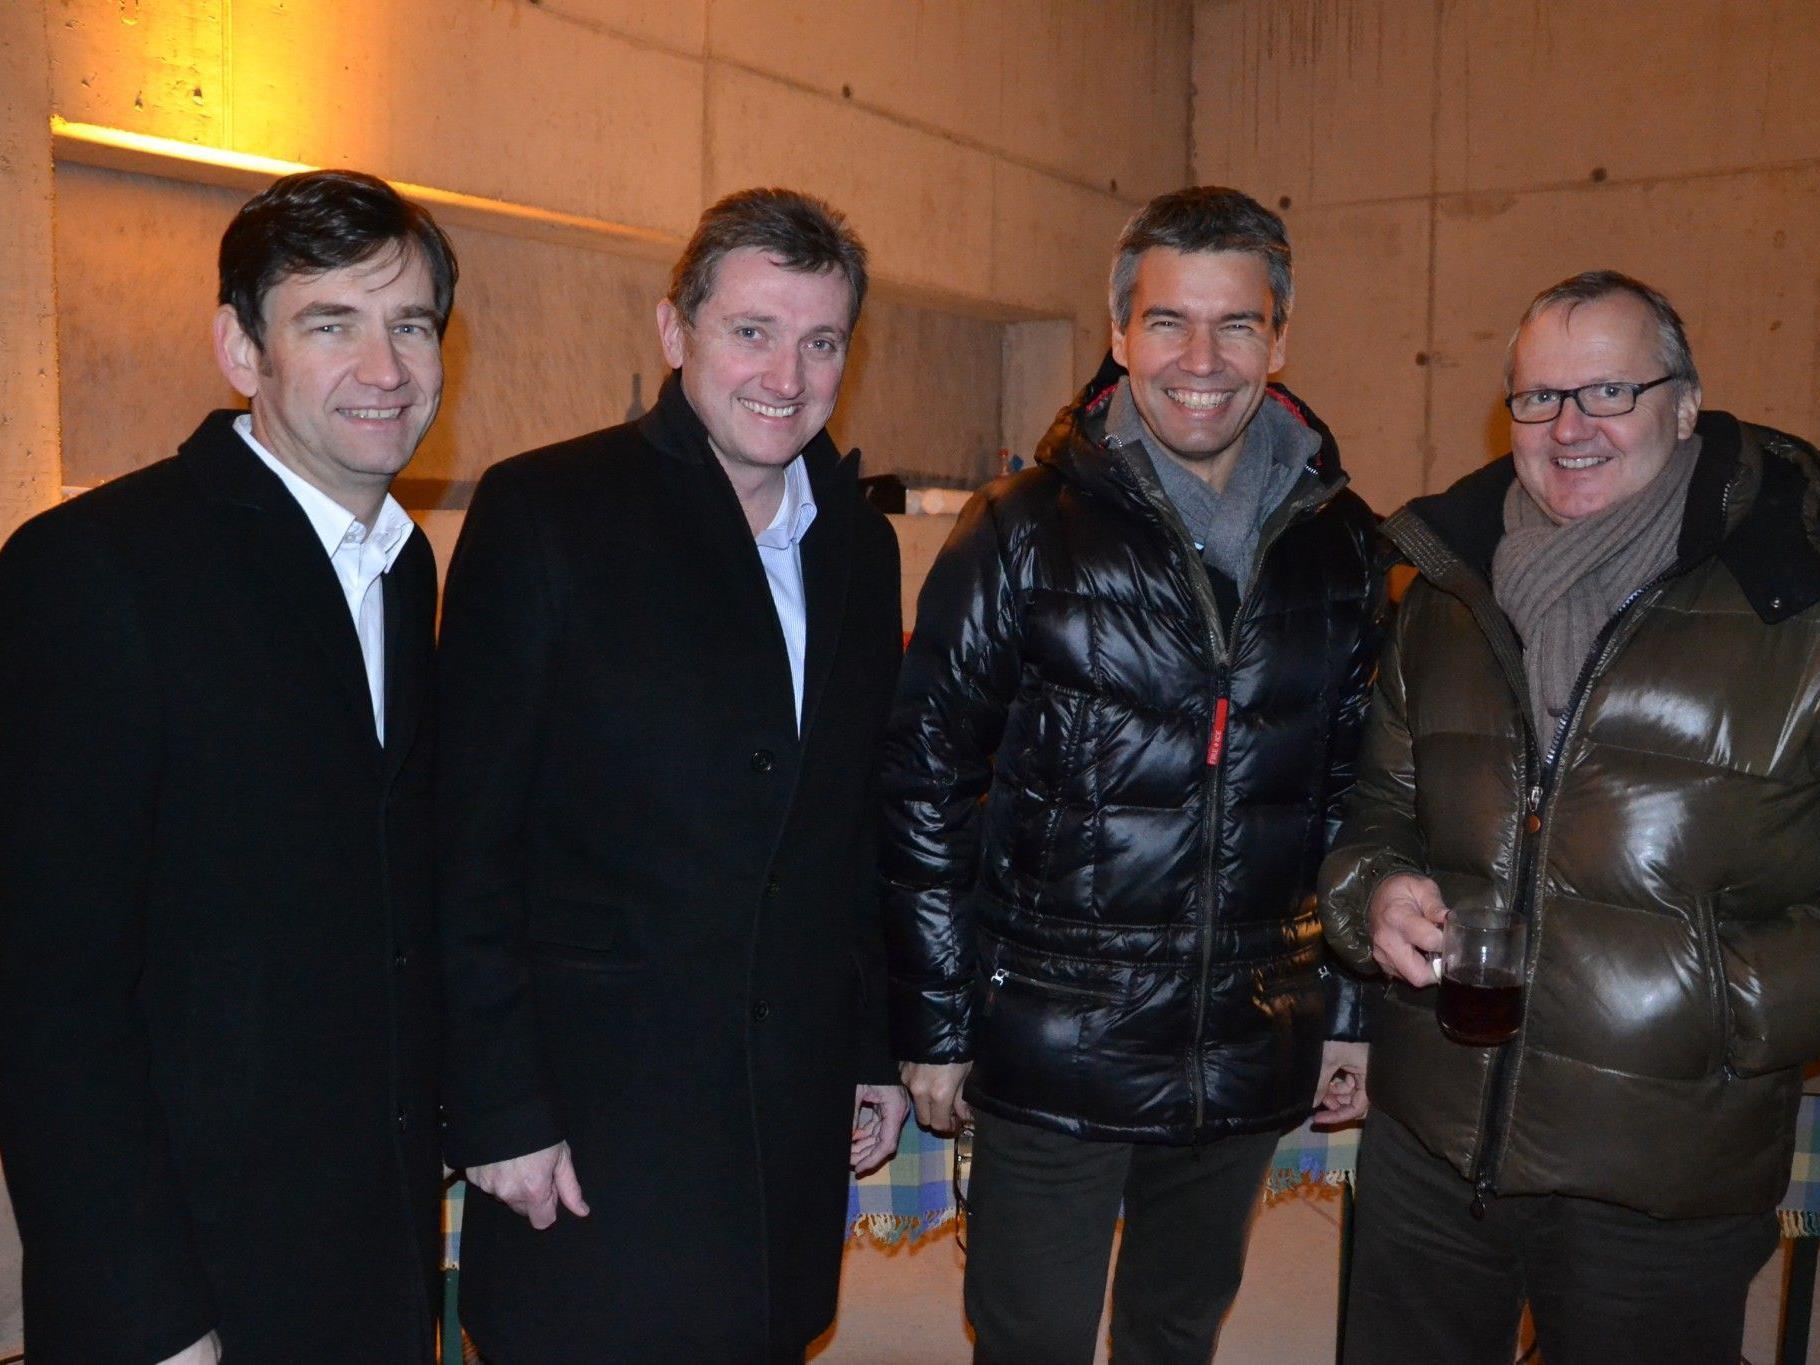 (v.l.) Wolfgang Rüf (Prisma), Architekt Gerhard Aicher, Egon Hajek (Prisma) & Peter Dönz (Bau Consult Dönz)